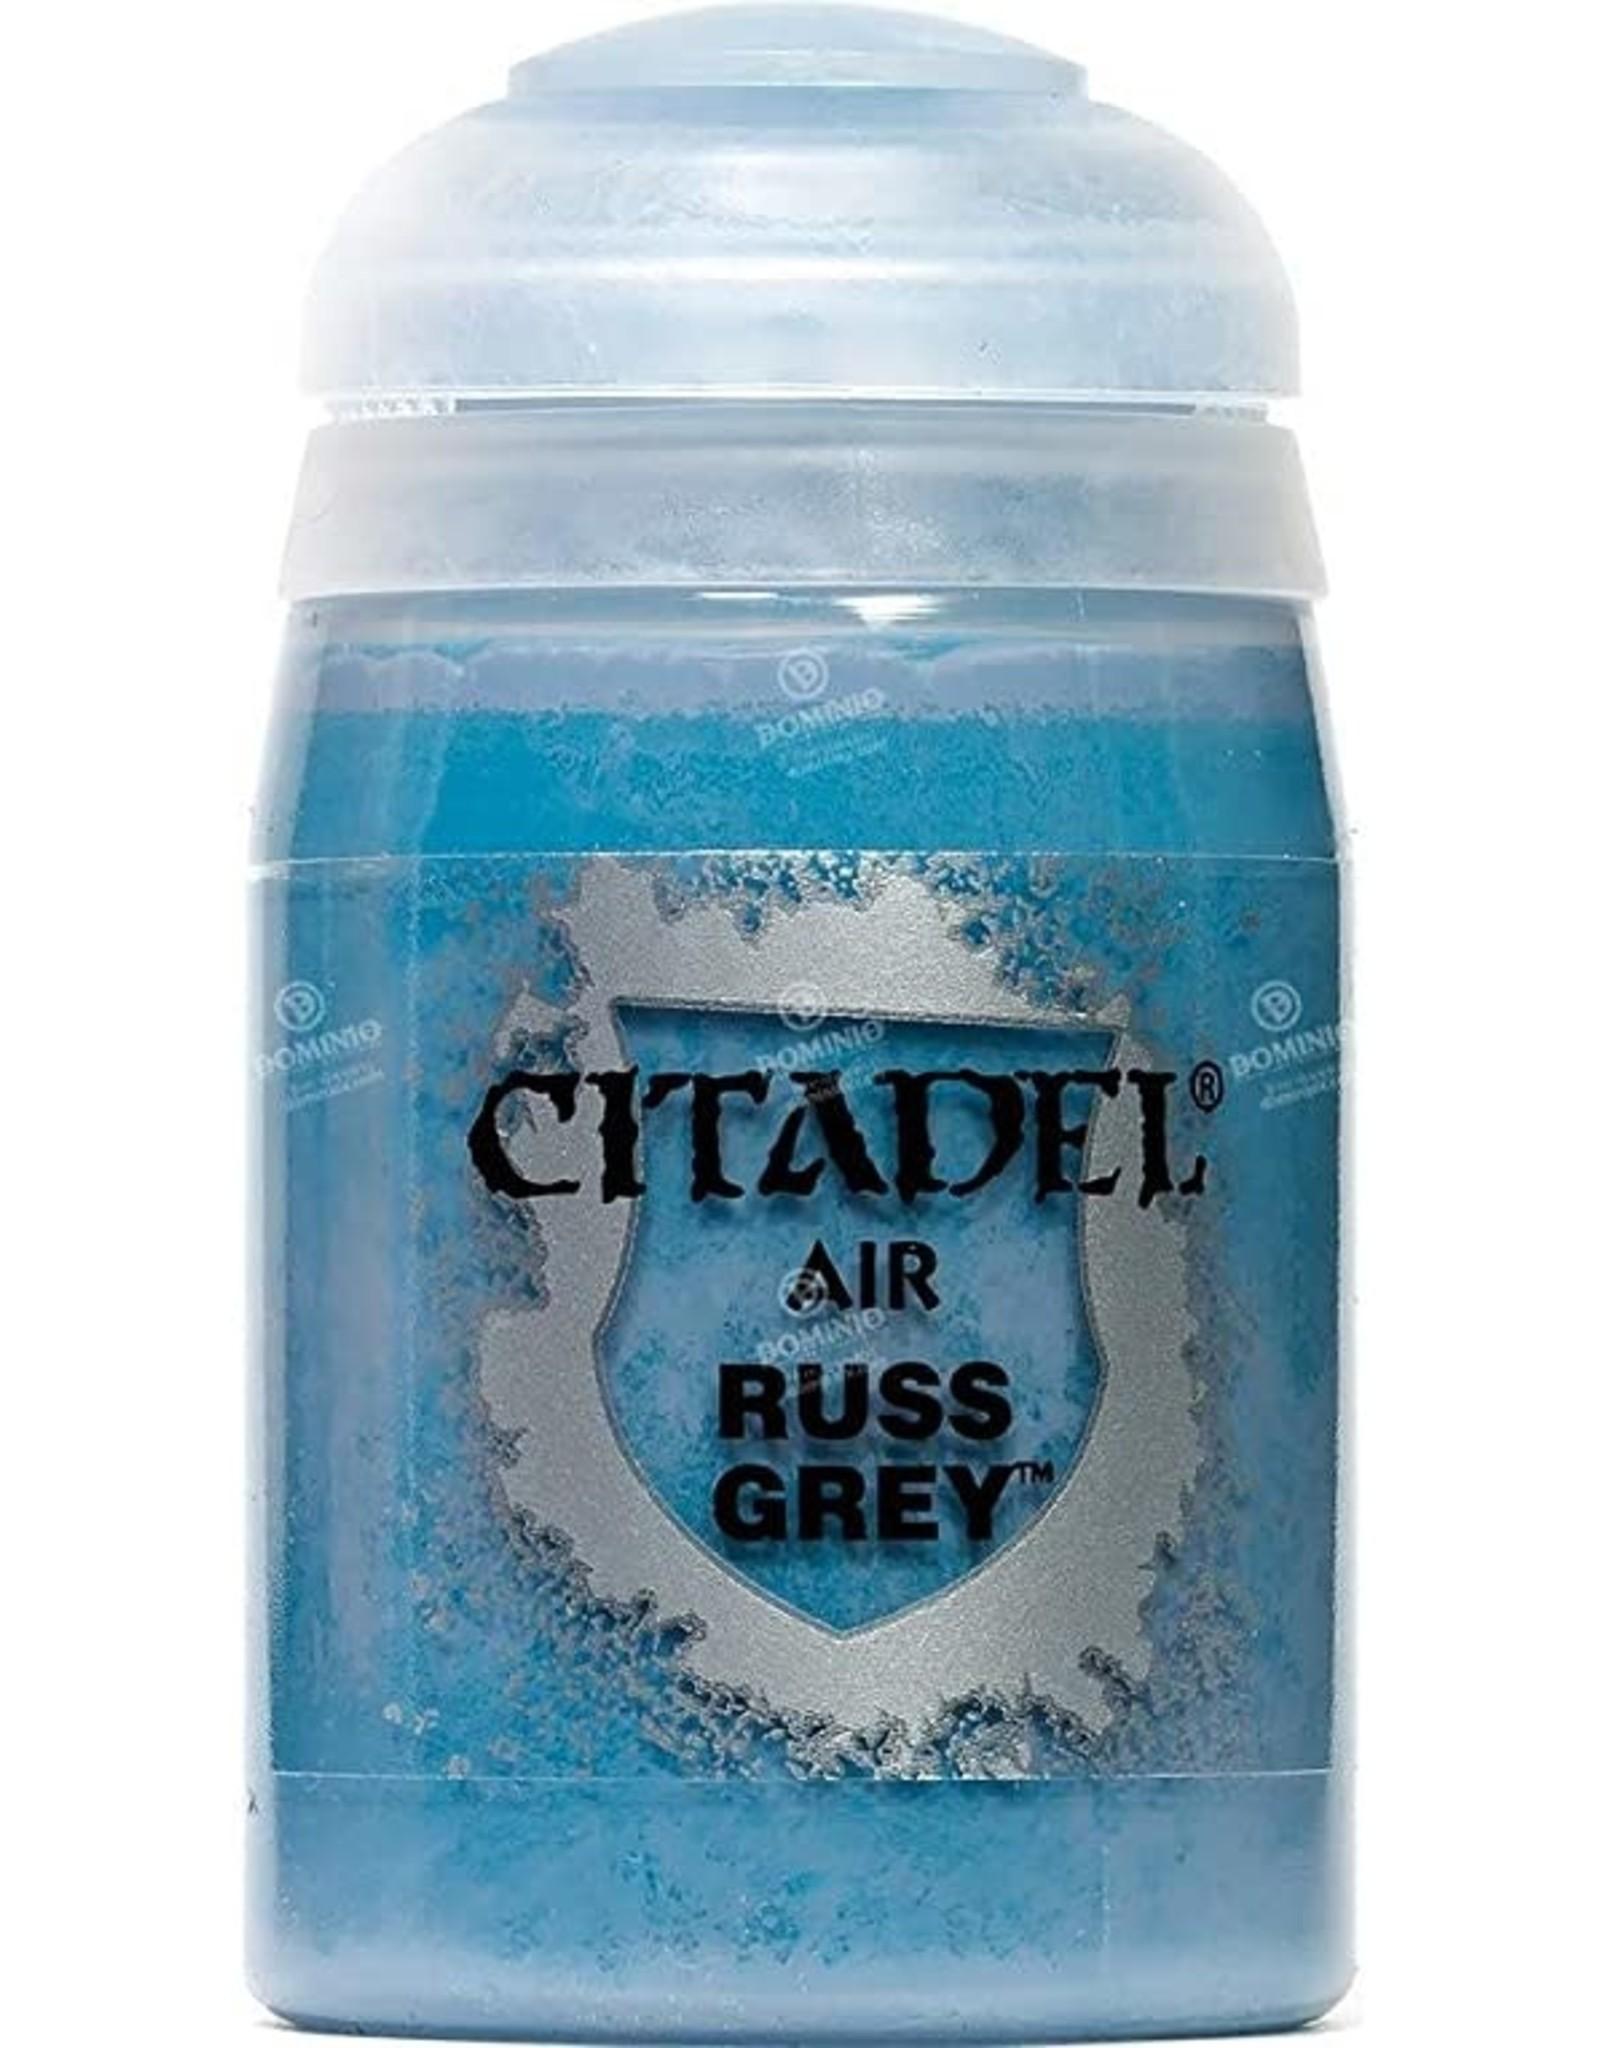 Games Workshop Citadel Paint: Russ Grey Air (24 ml)